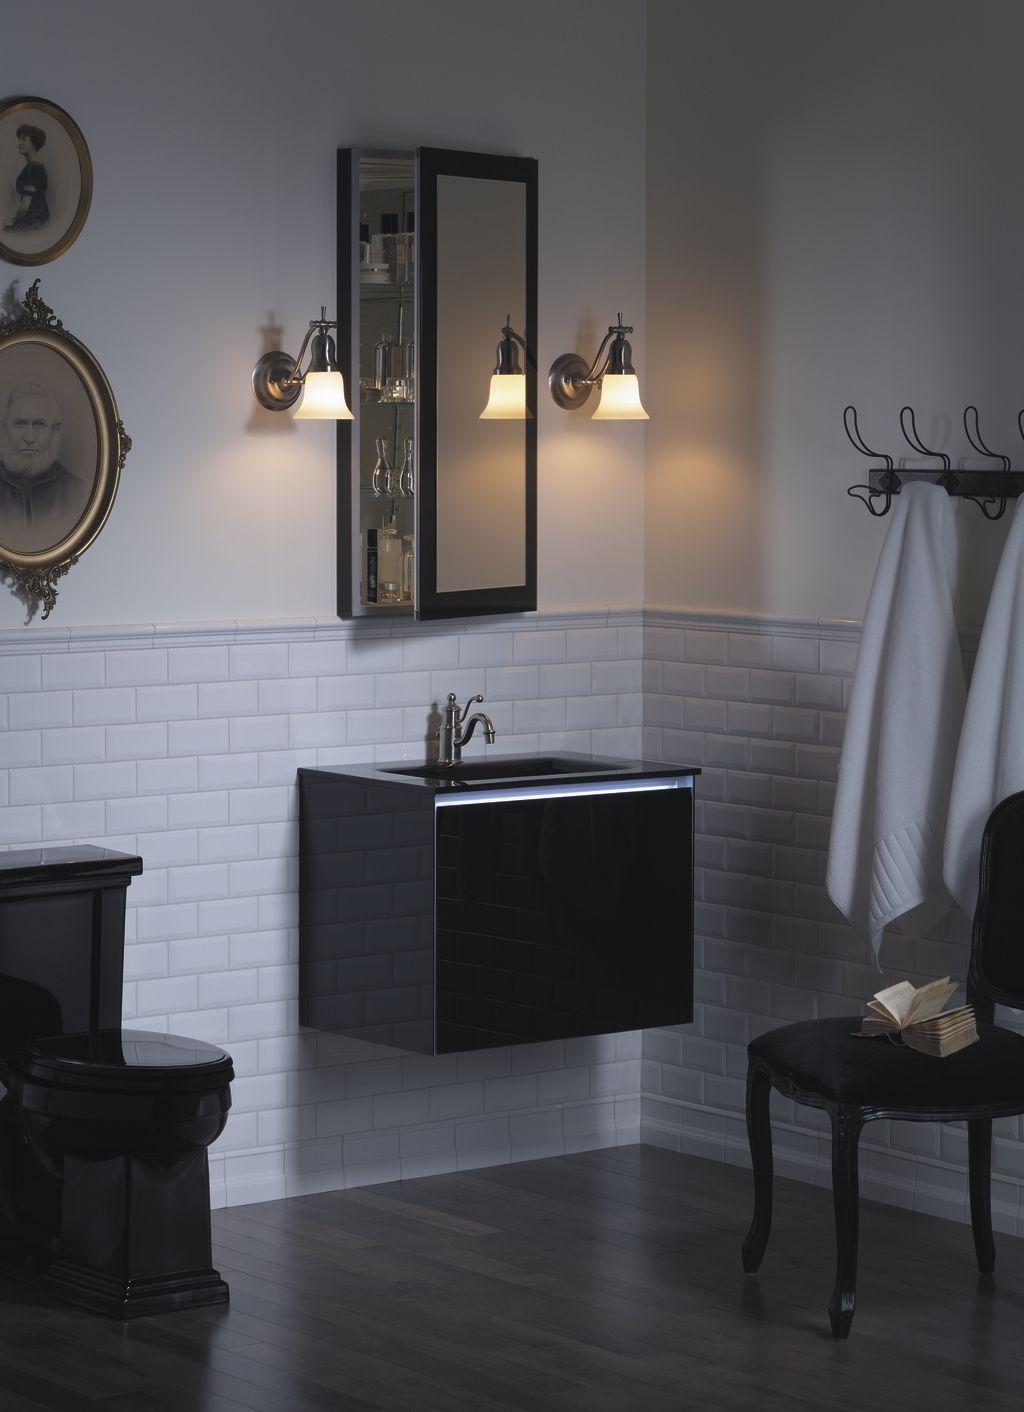 Black Toilet And Vanity Bathroom Design Black Bathroom Design